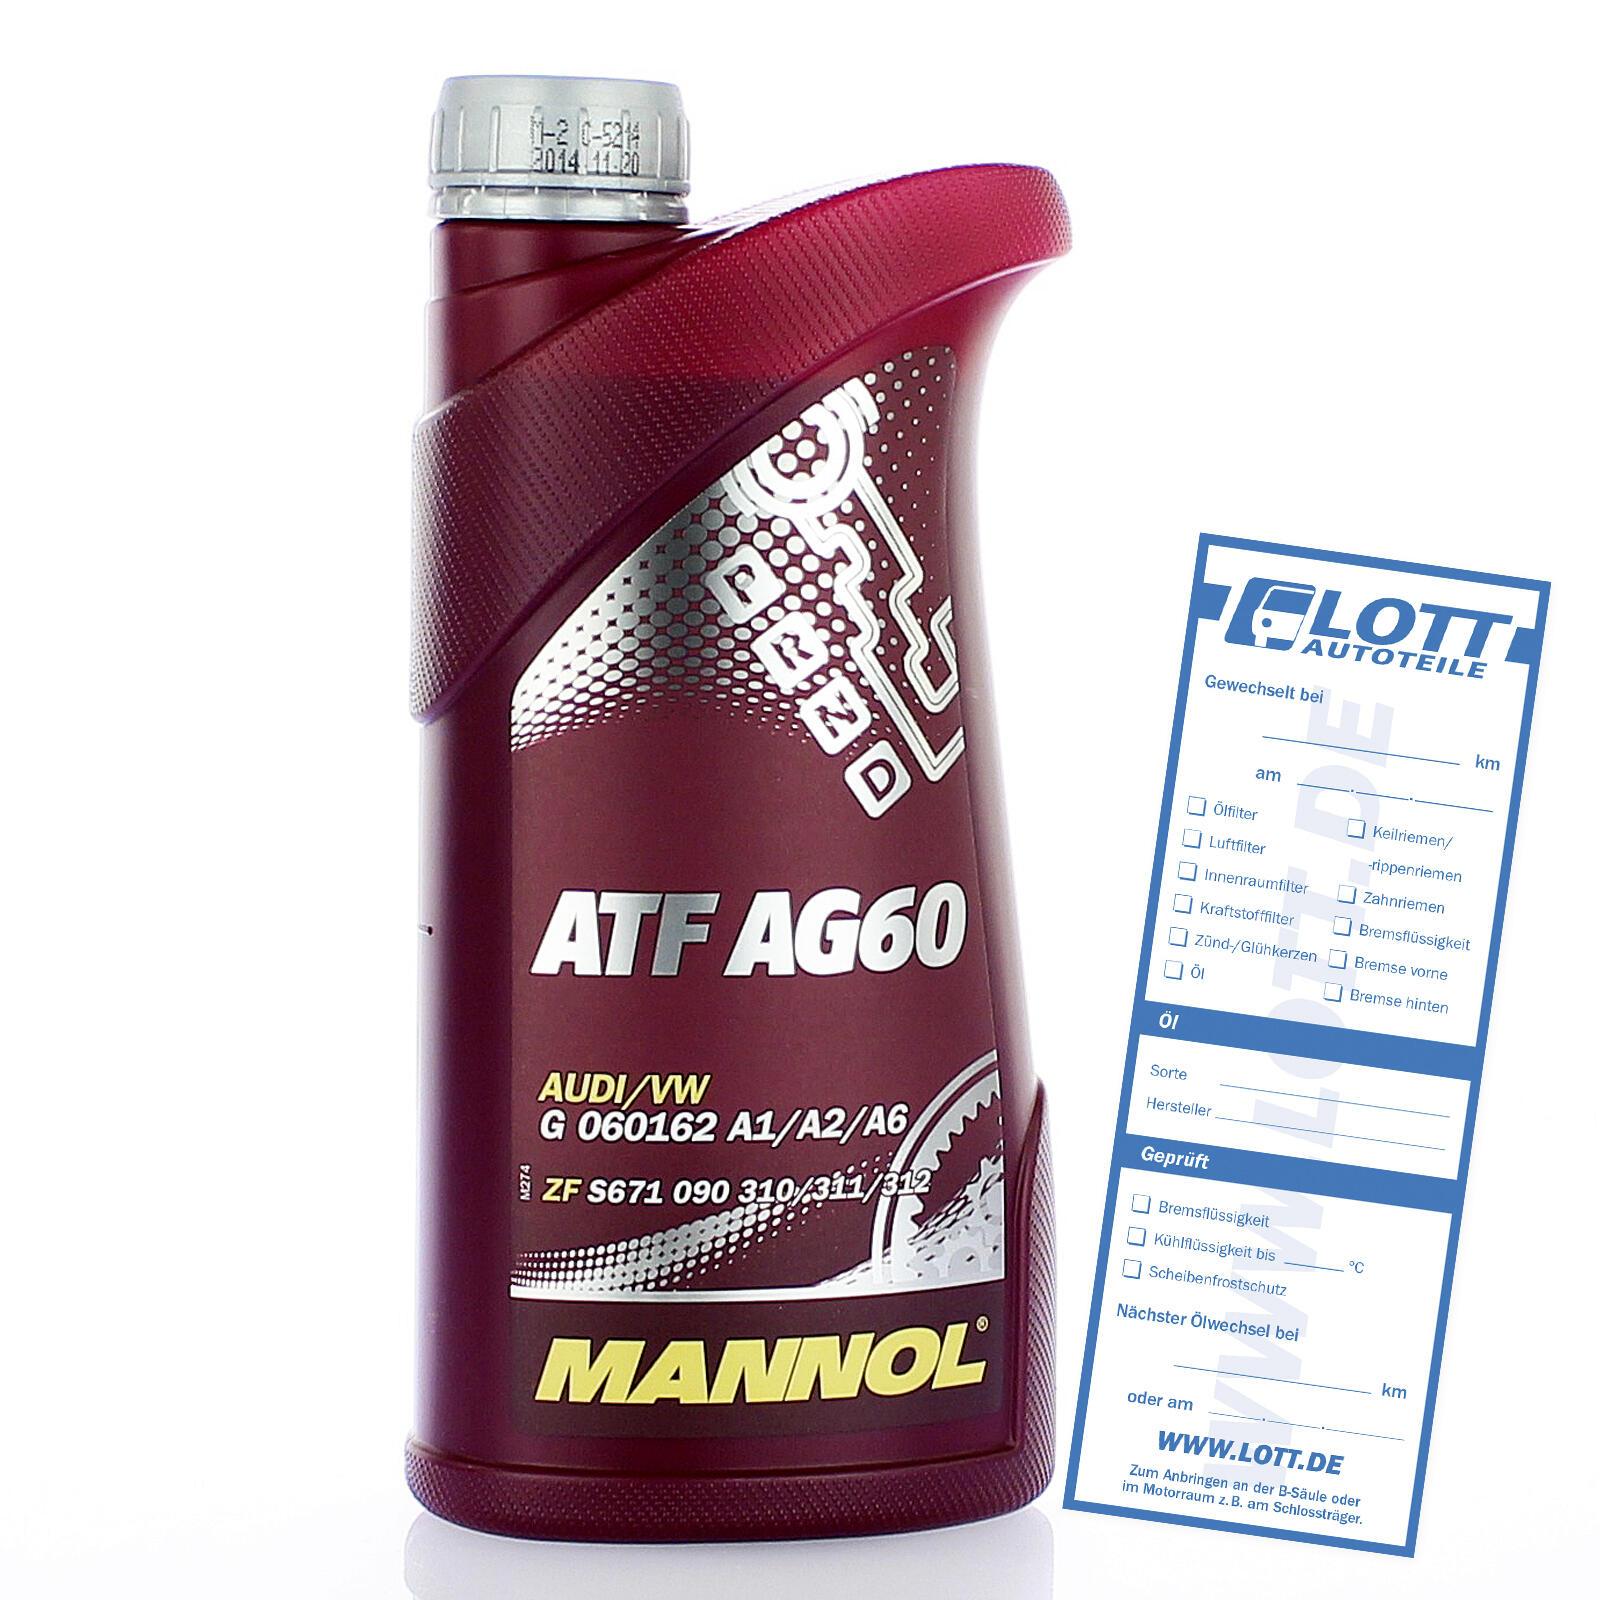 MANNOL ATF AG60 AUTOMATIC SPECIAL  GETRIEBEÖL 1 Liter